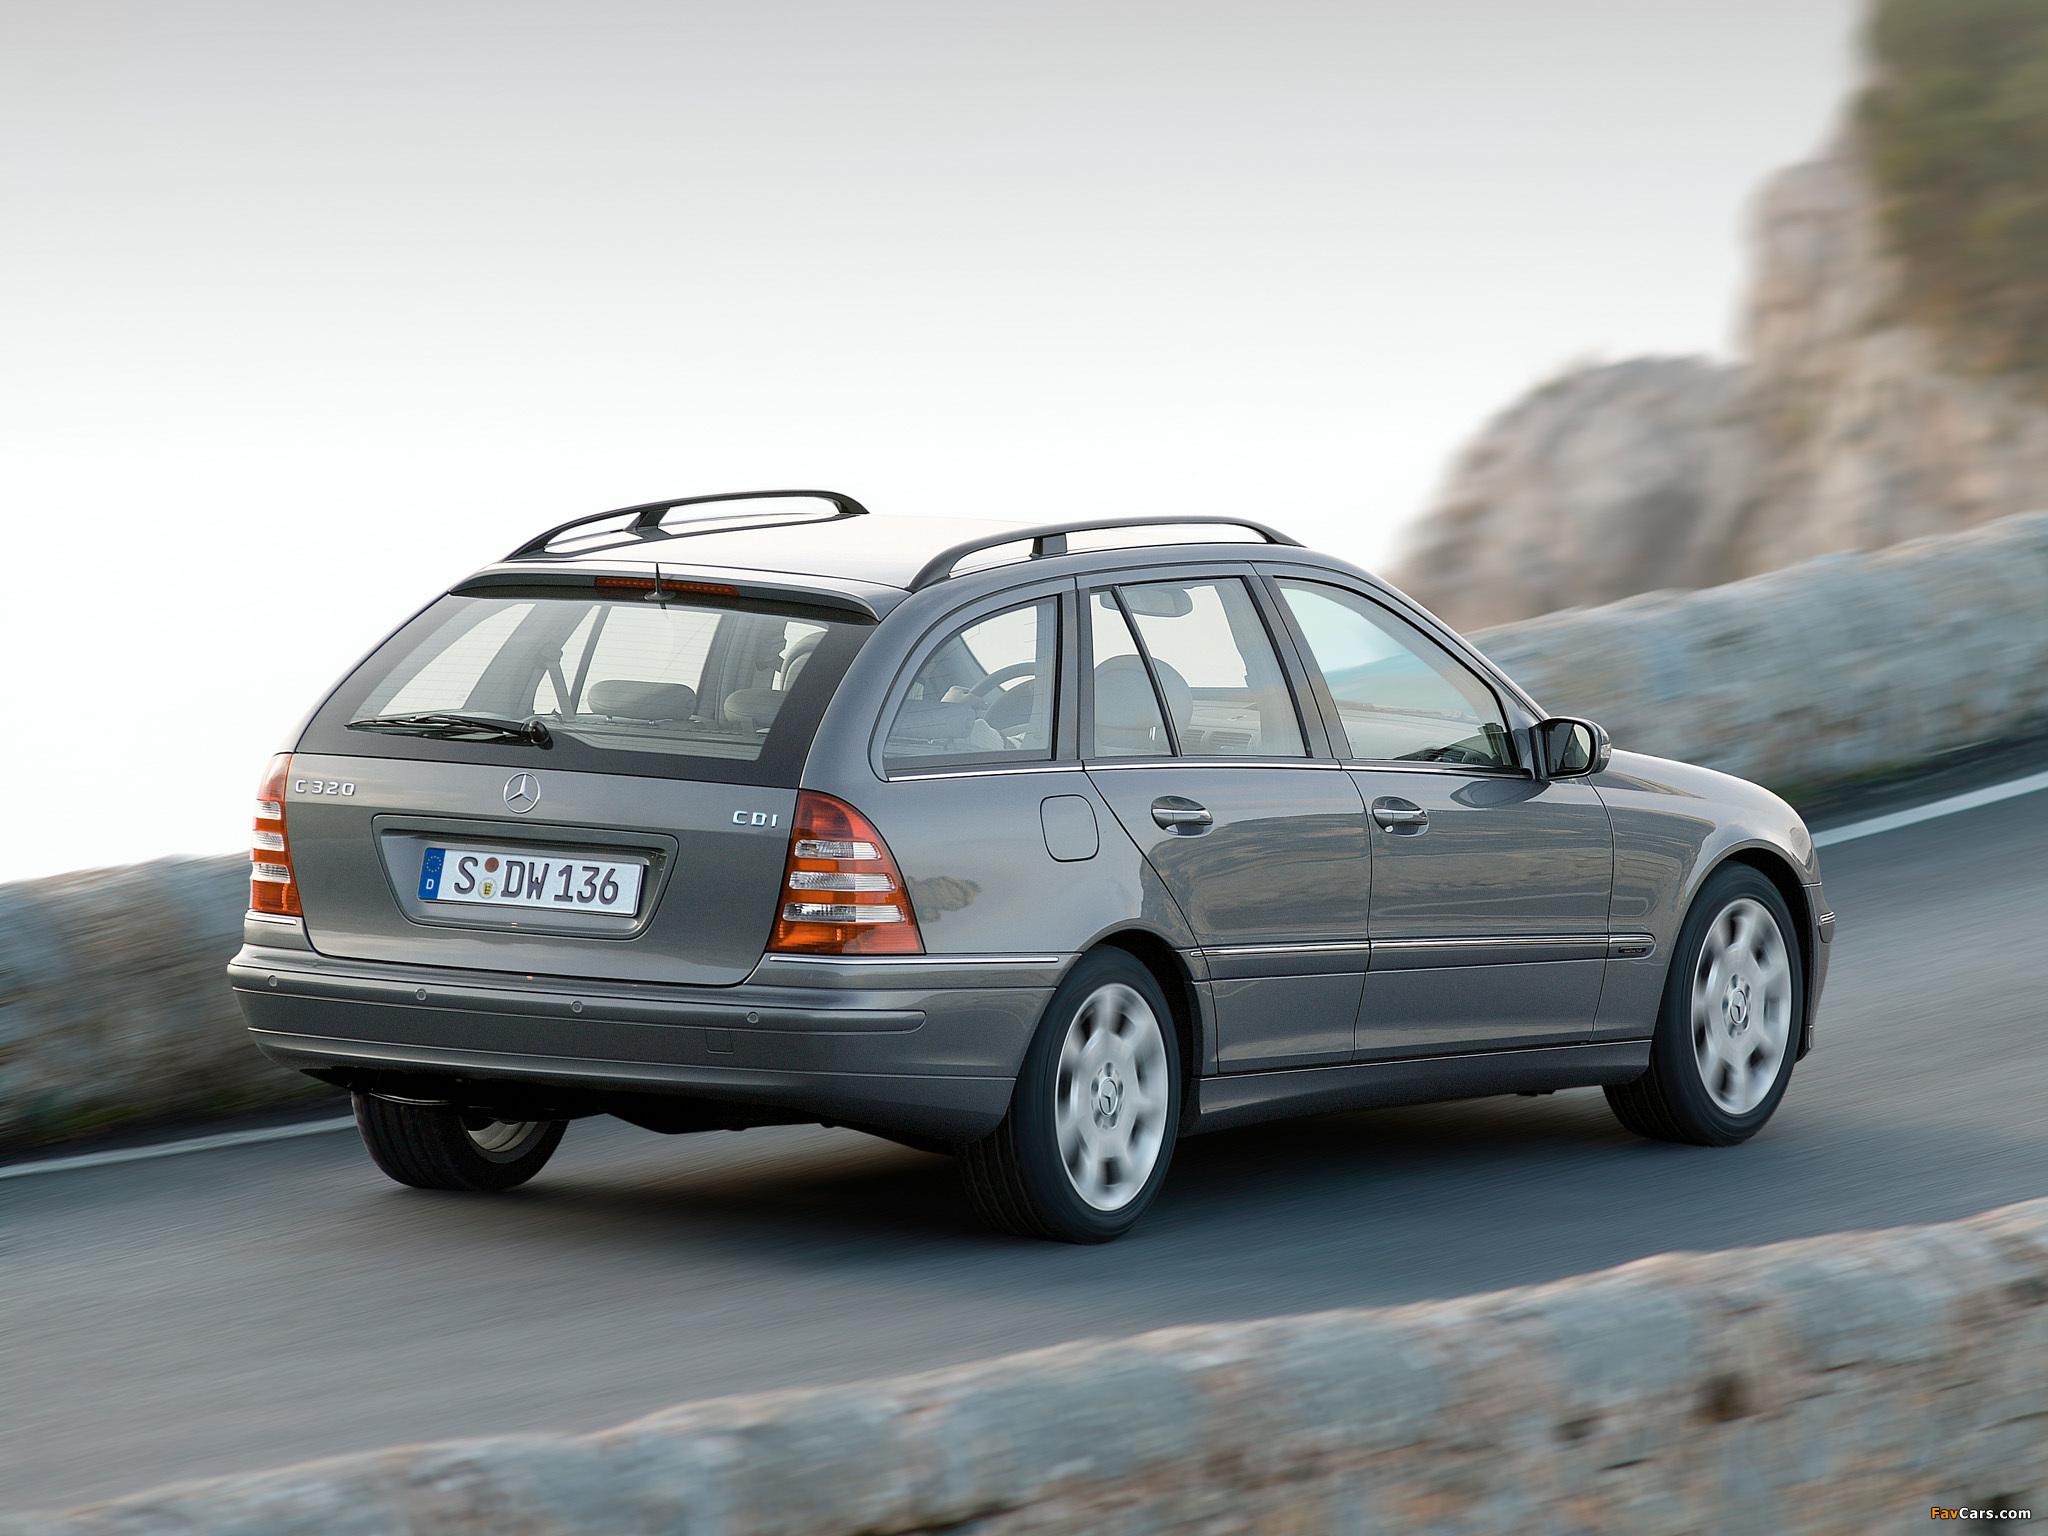 Mercedes-Benz C 320 CDI Estate (S203) 2002–07 wallpapers (2048 x 1536)